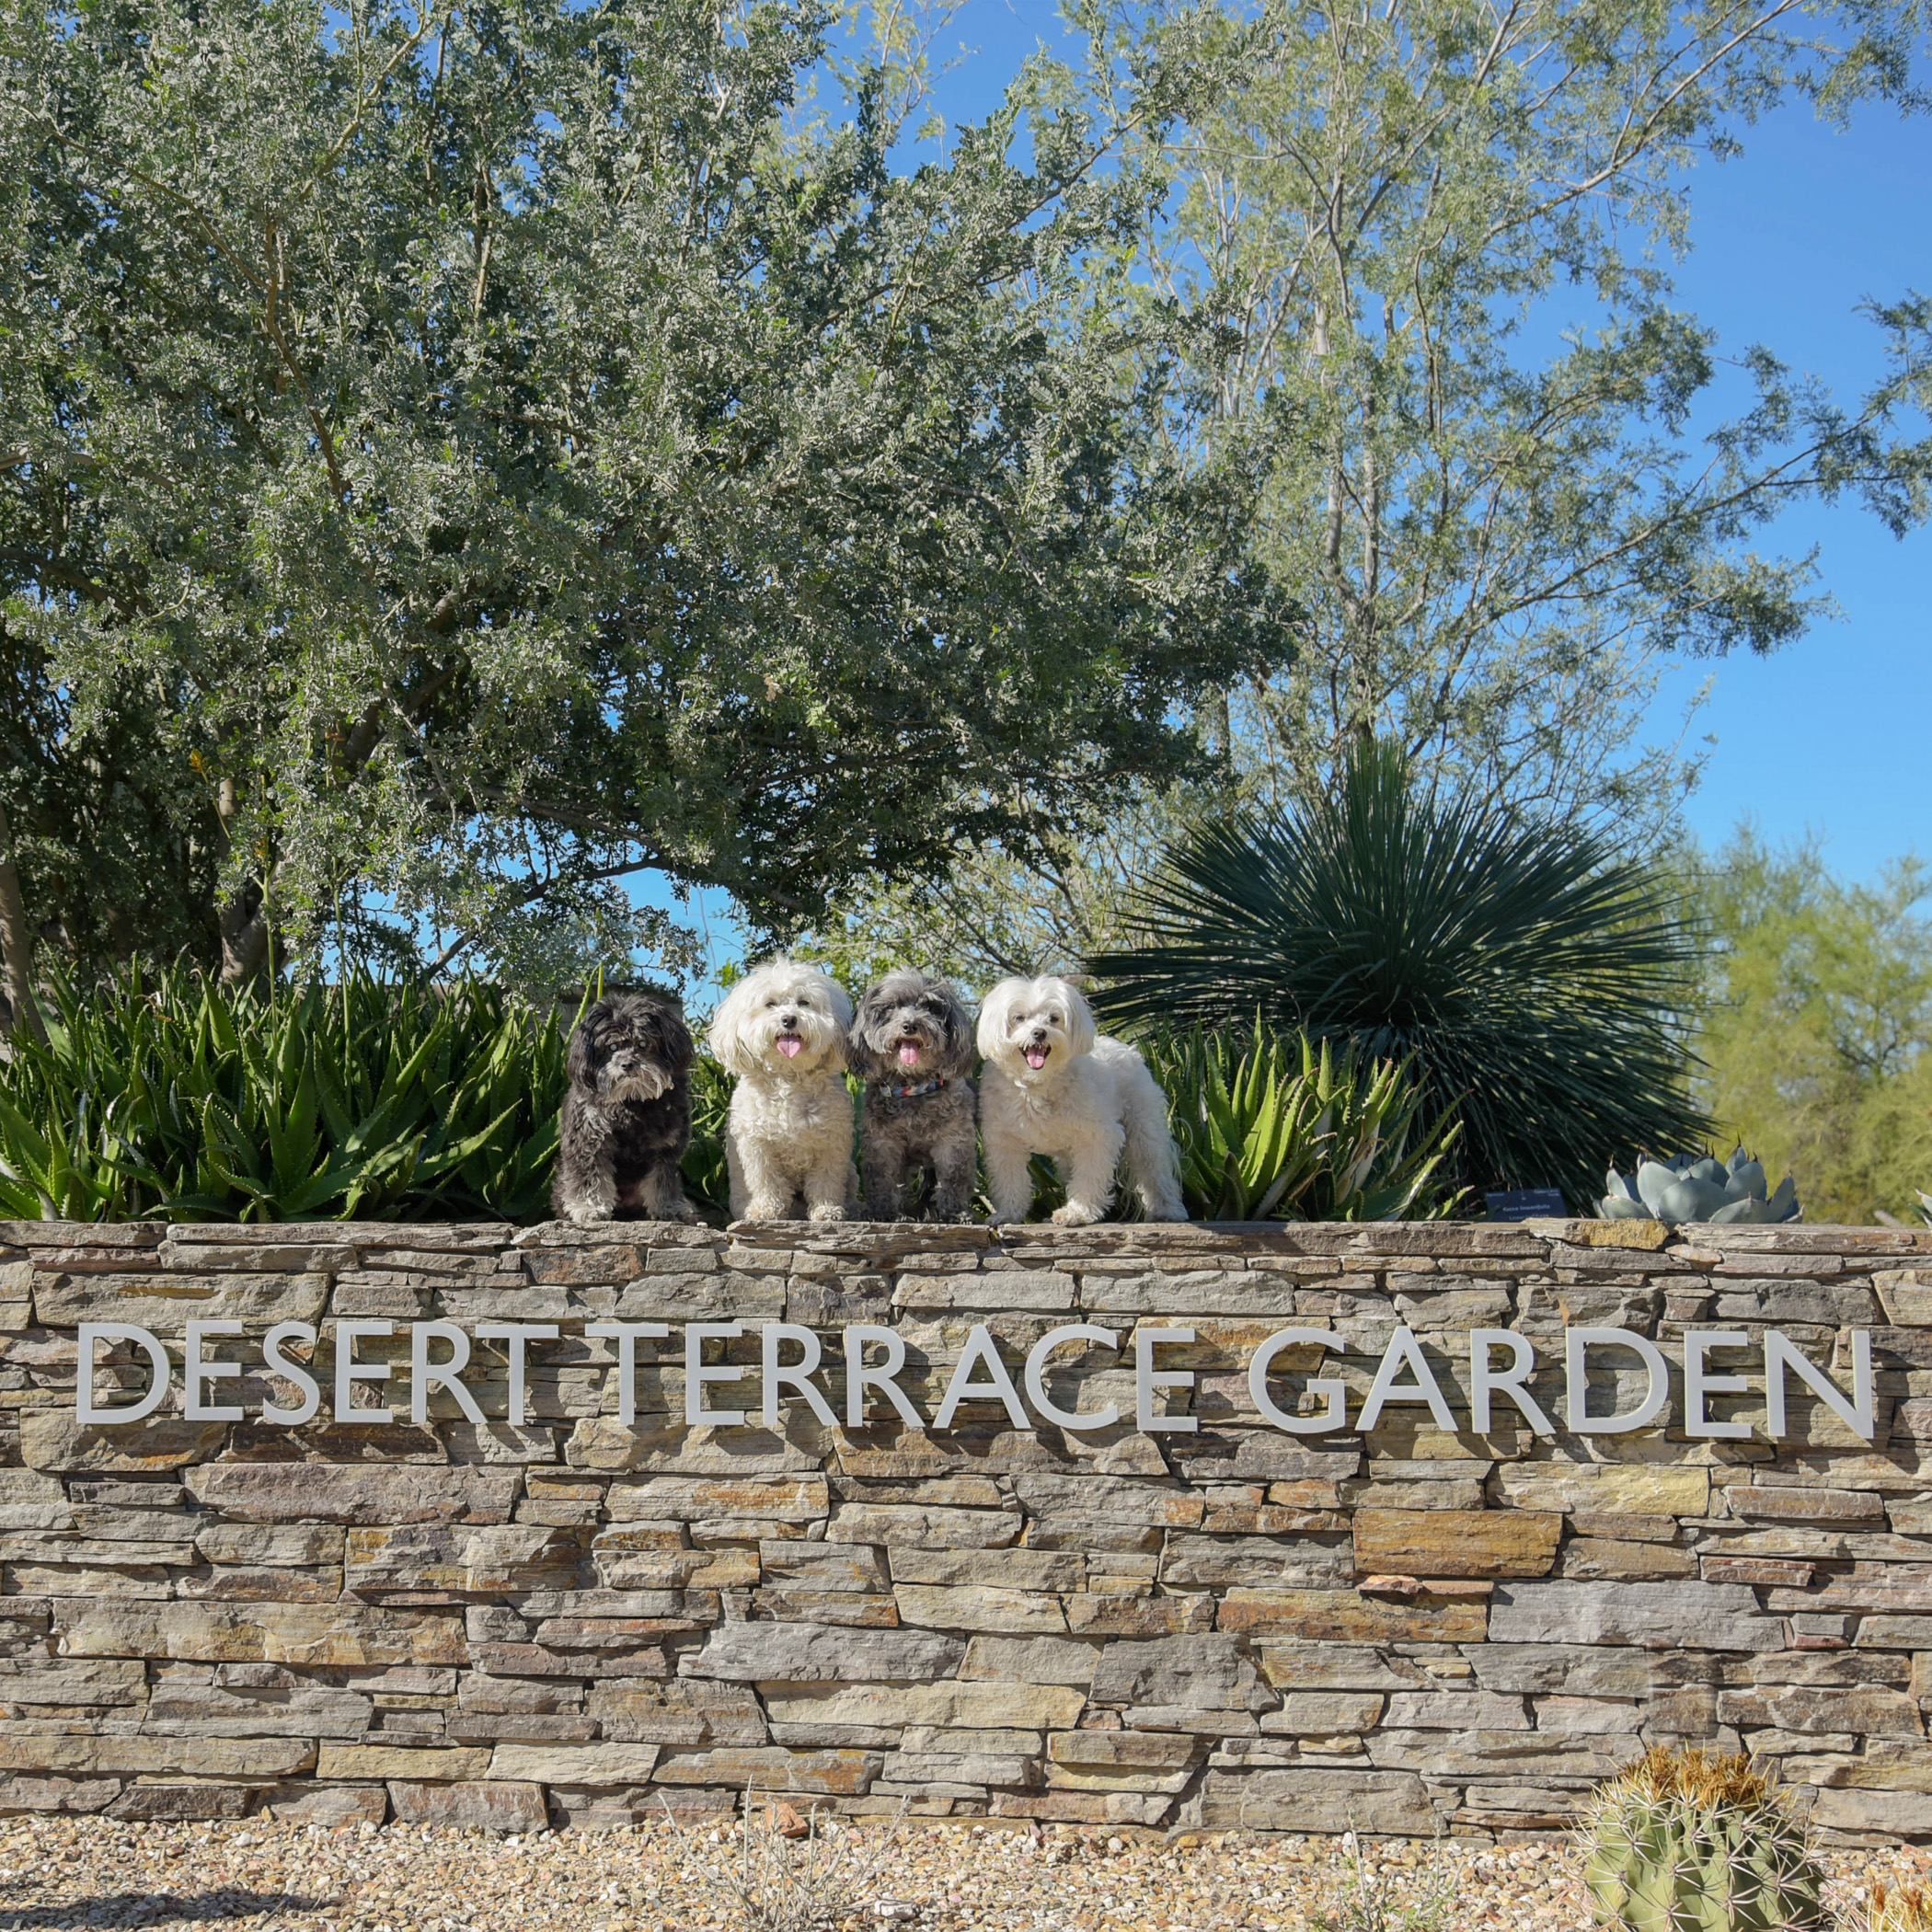 Just four little pups exploring the big, beautiful desert!